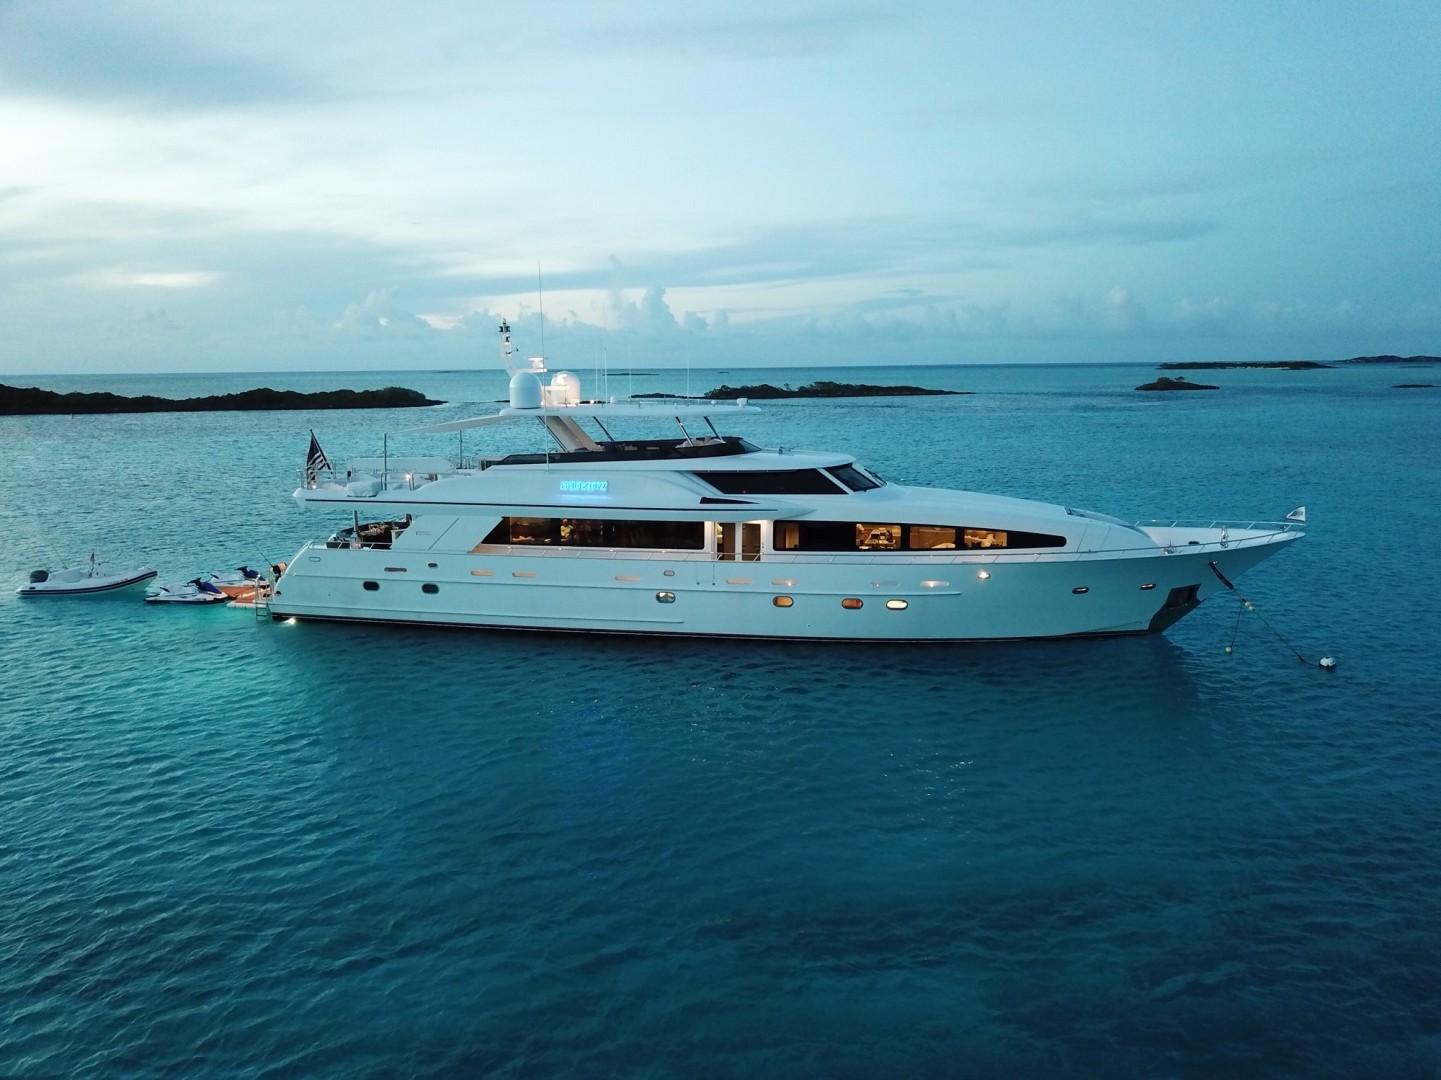 WONDER-yacht-for-sale-charter-01.jpeg